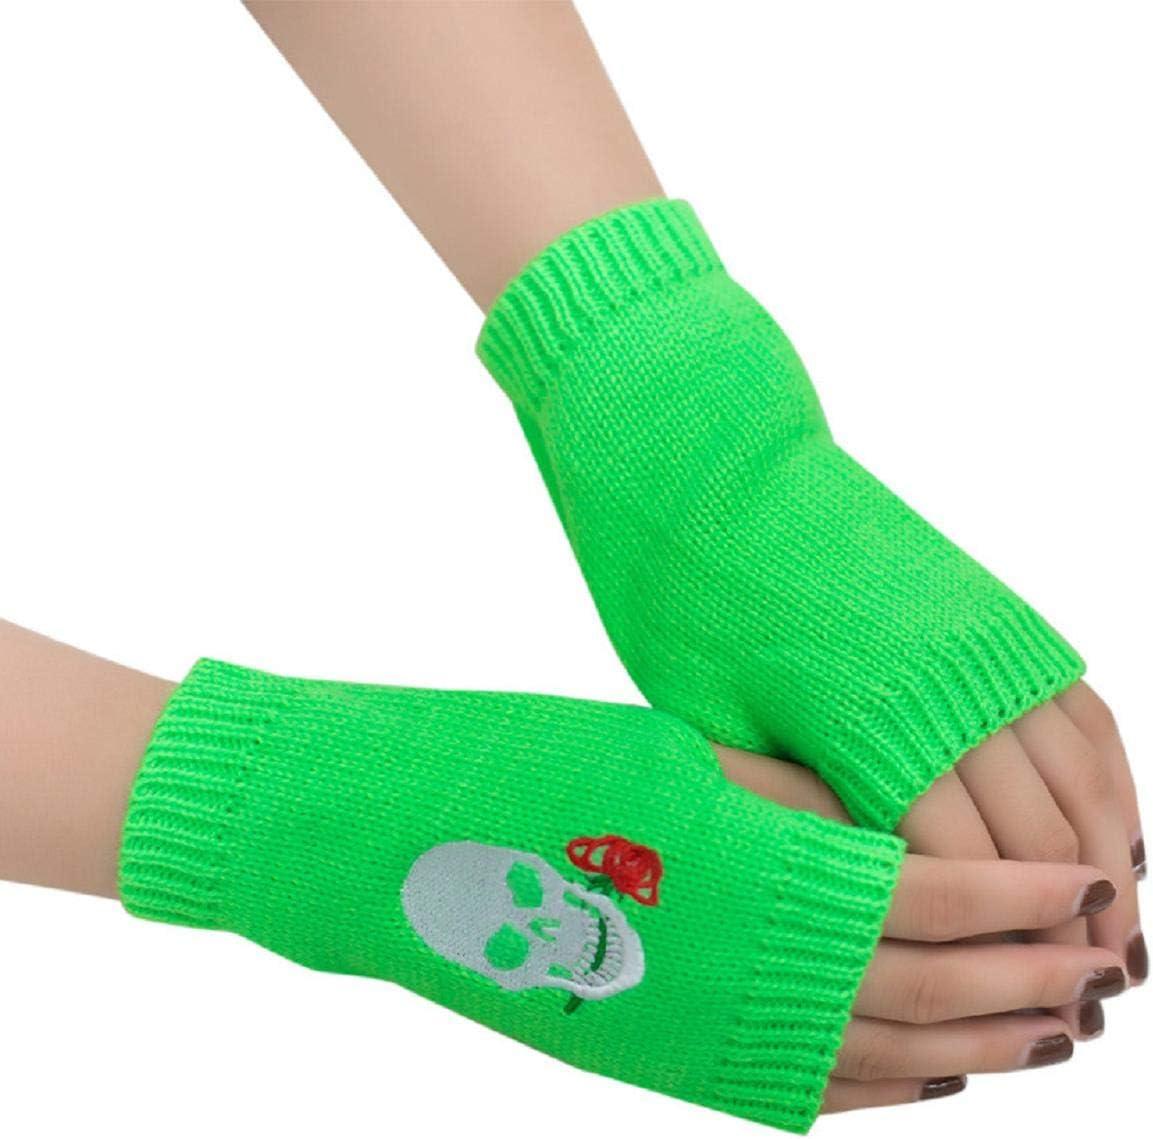 Women Girl Knitted Wool Short Arm Fingerless Warm Winter Gloves Soft Warm Mittens for Weight Training Cycling Skating Climbing Barlingrock Sports Fitness Gloves Skiing Biking